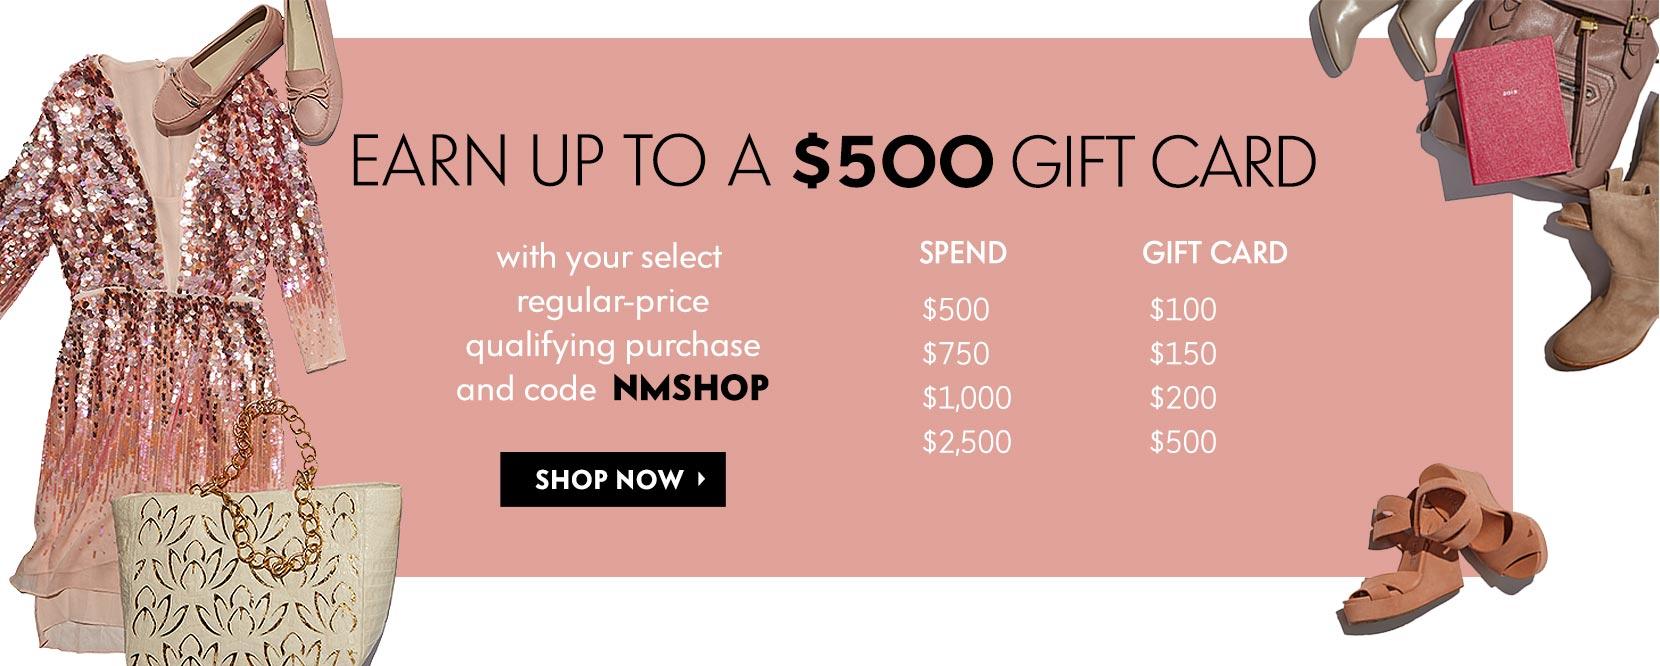 Neiman marcus credit card - Neiman Marcus Credit Card 42